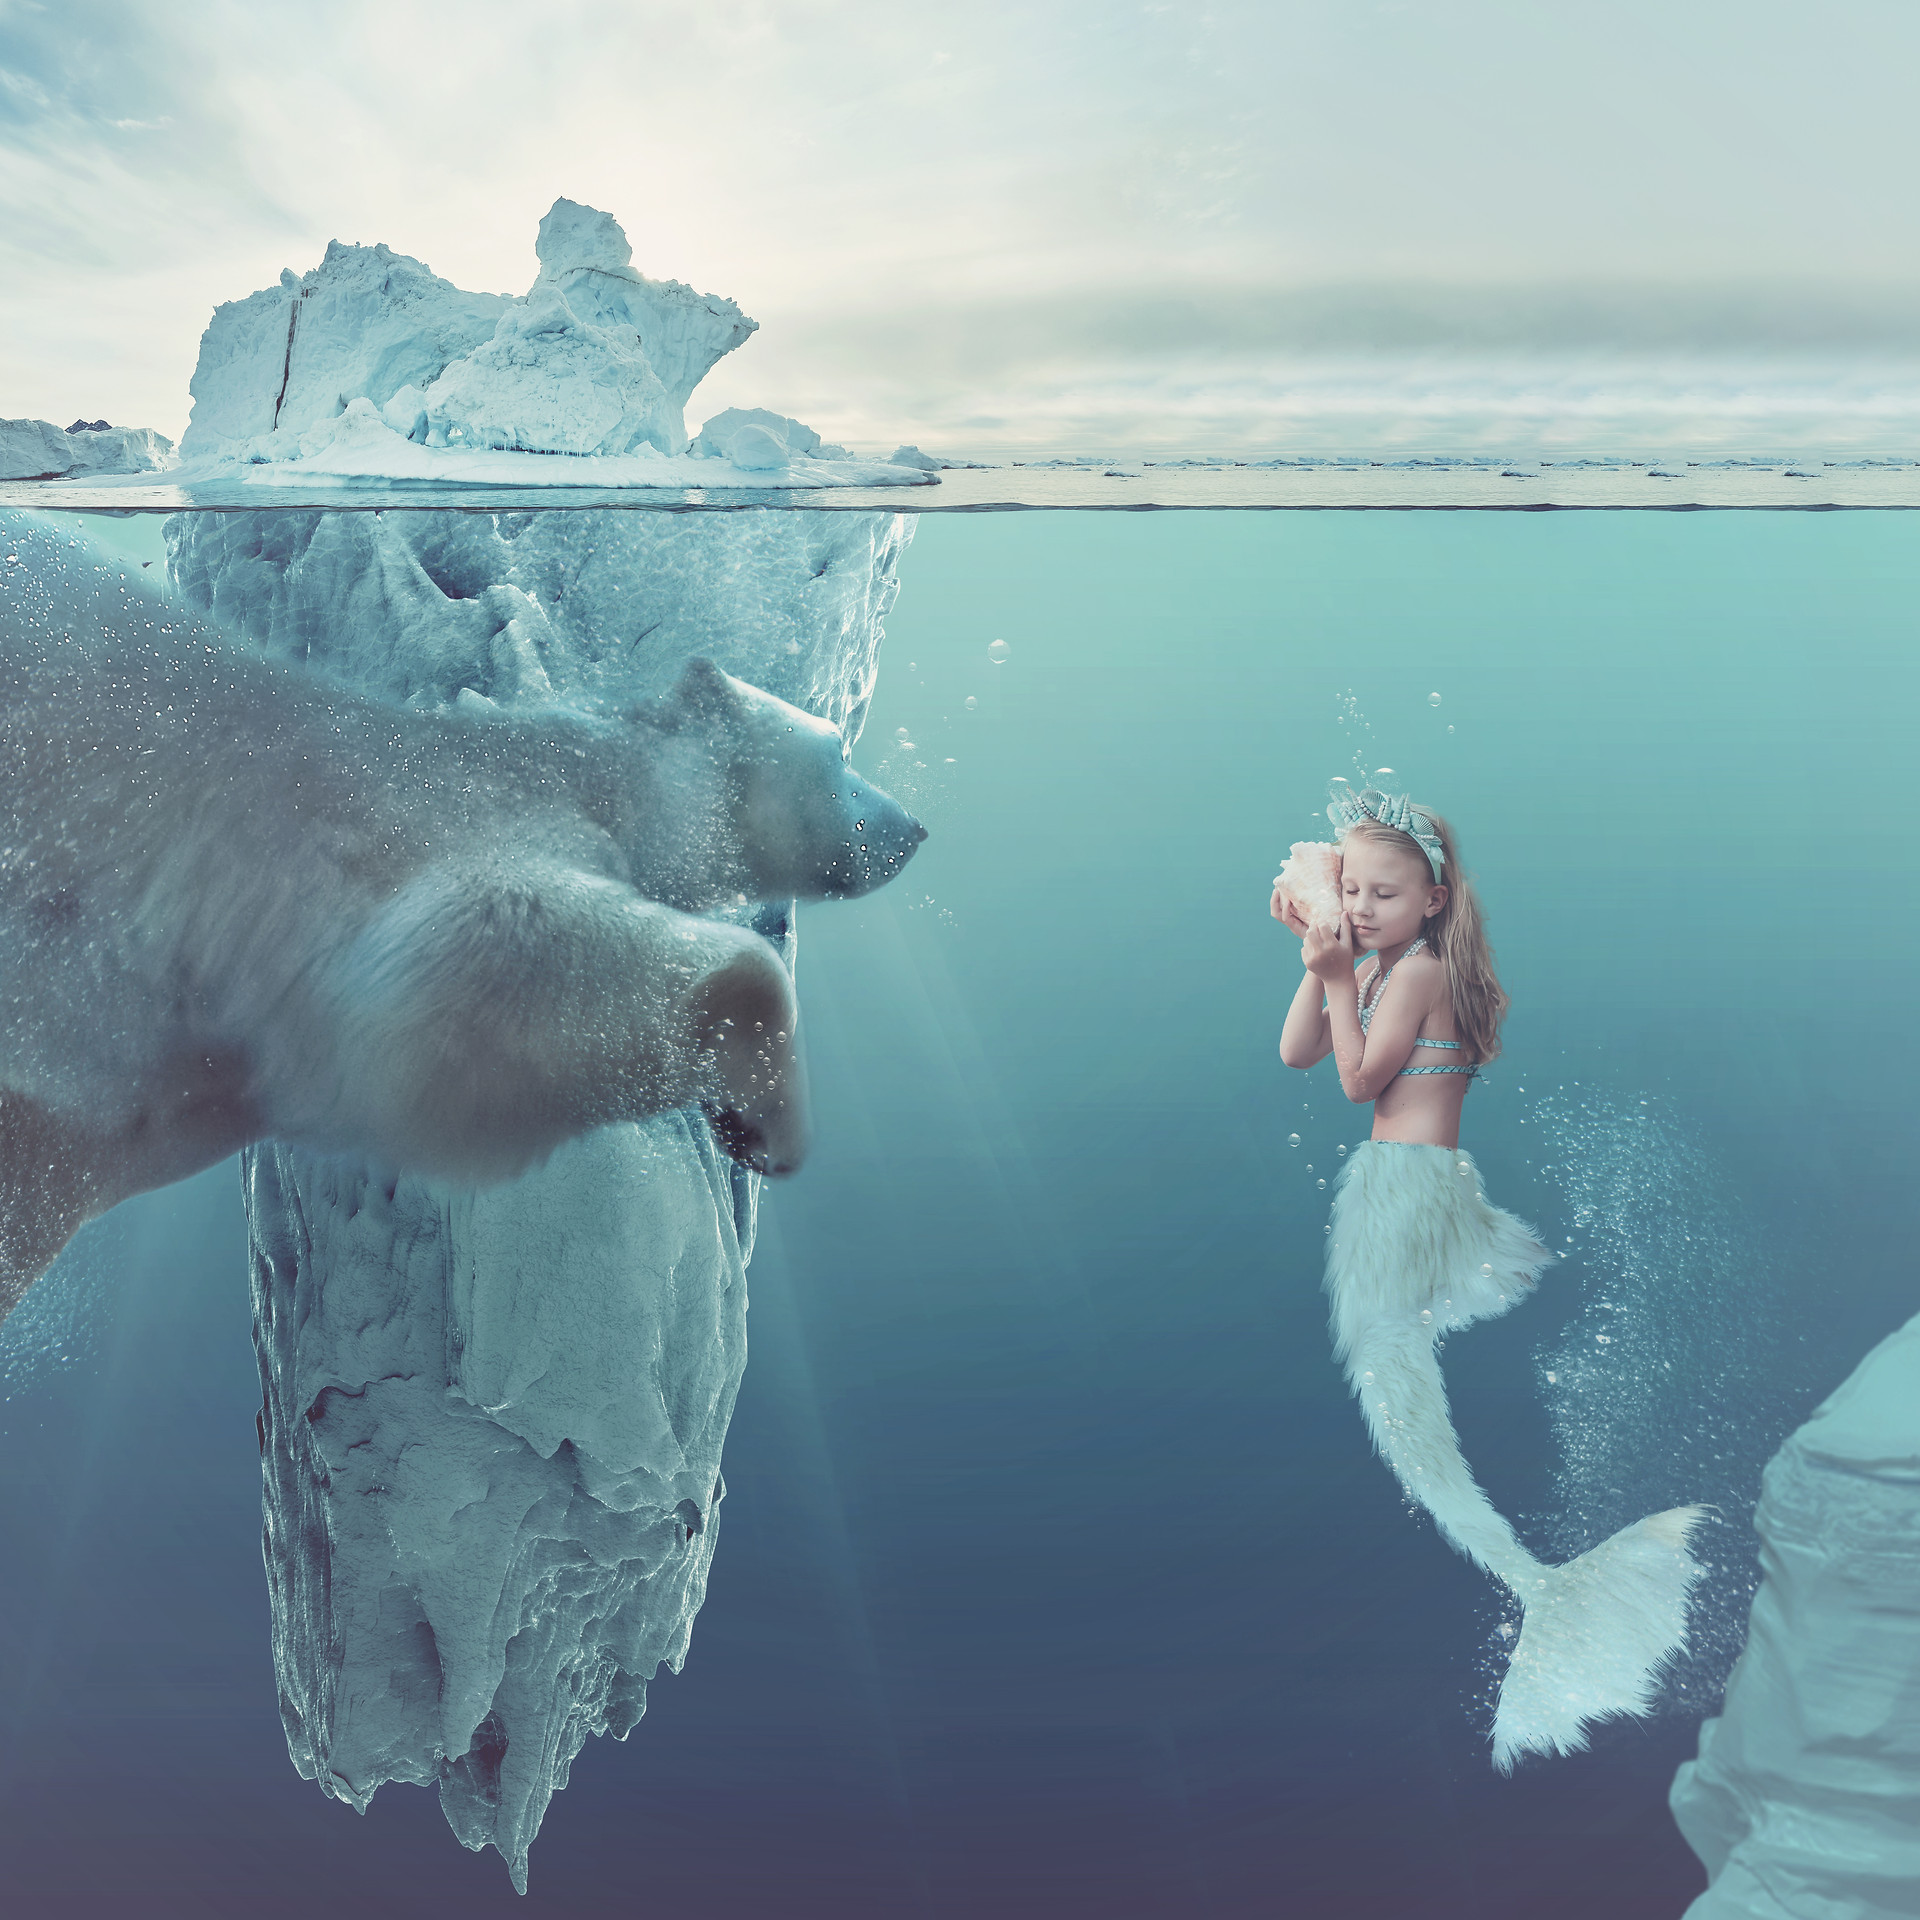 Mermaid Polar Bear. Creative Children's Photography fantasy photoshoot, Dream Alice Photography & Art, Gold Coast